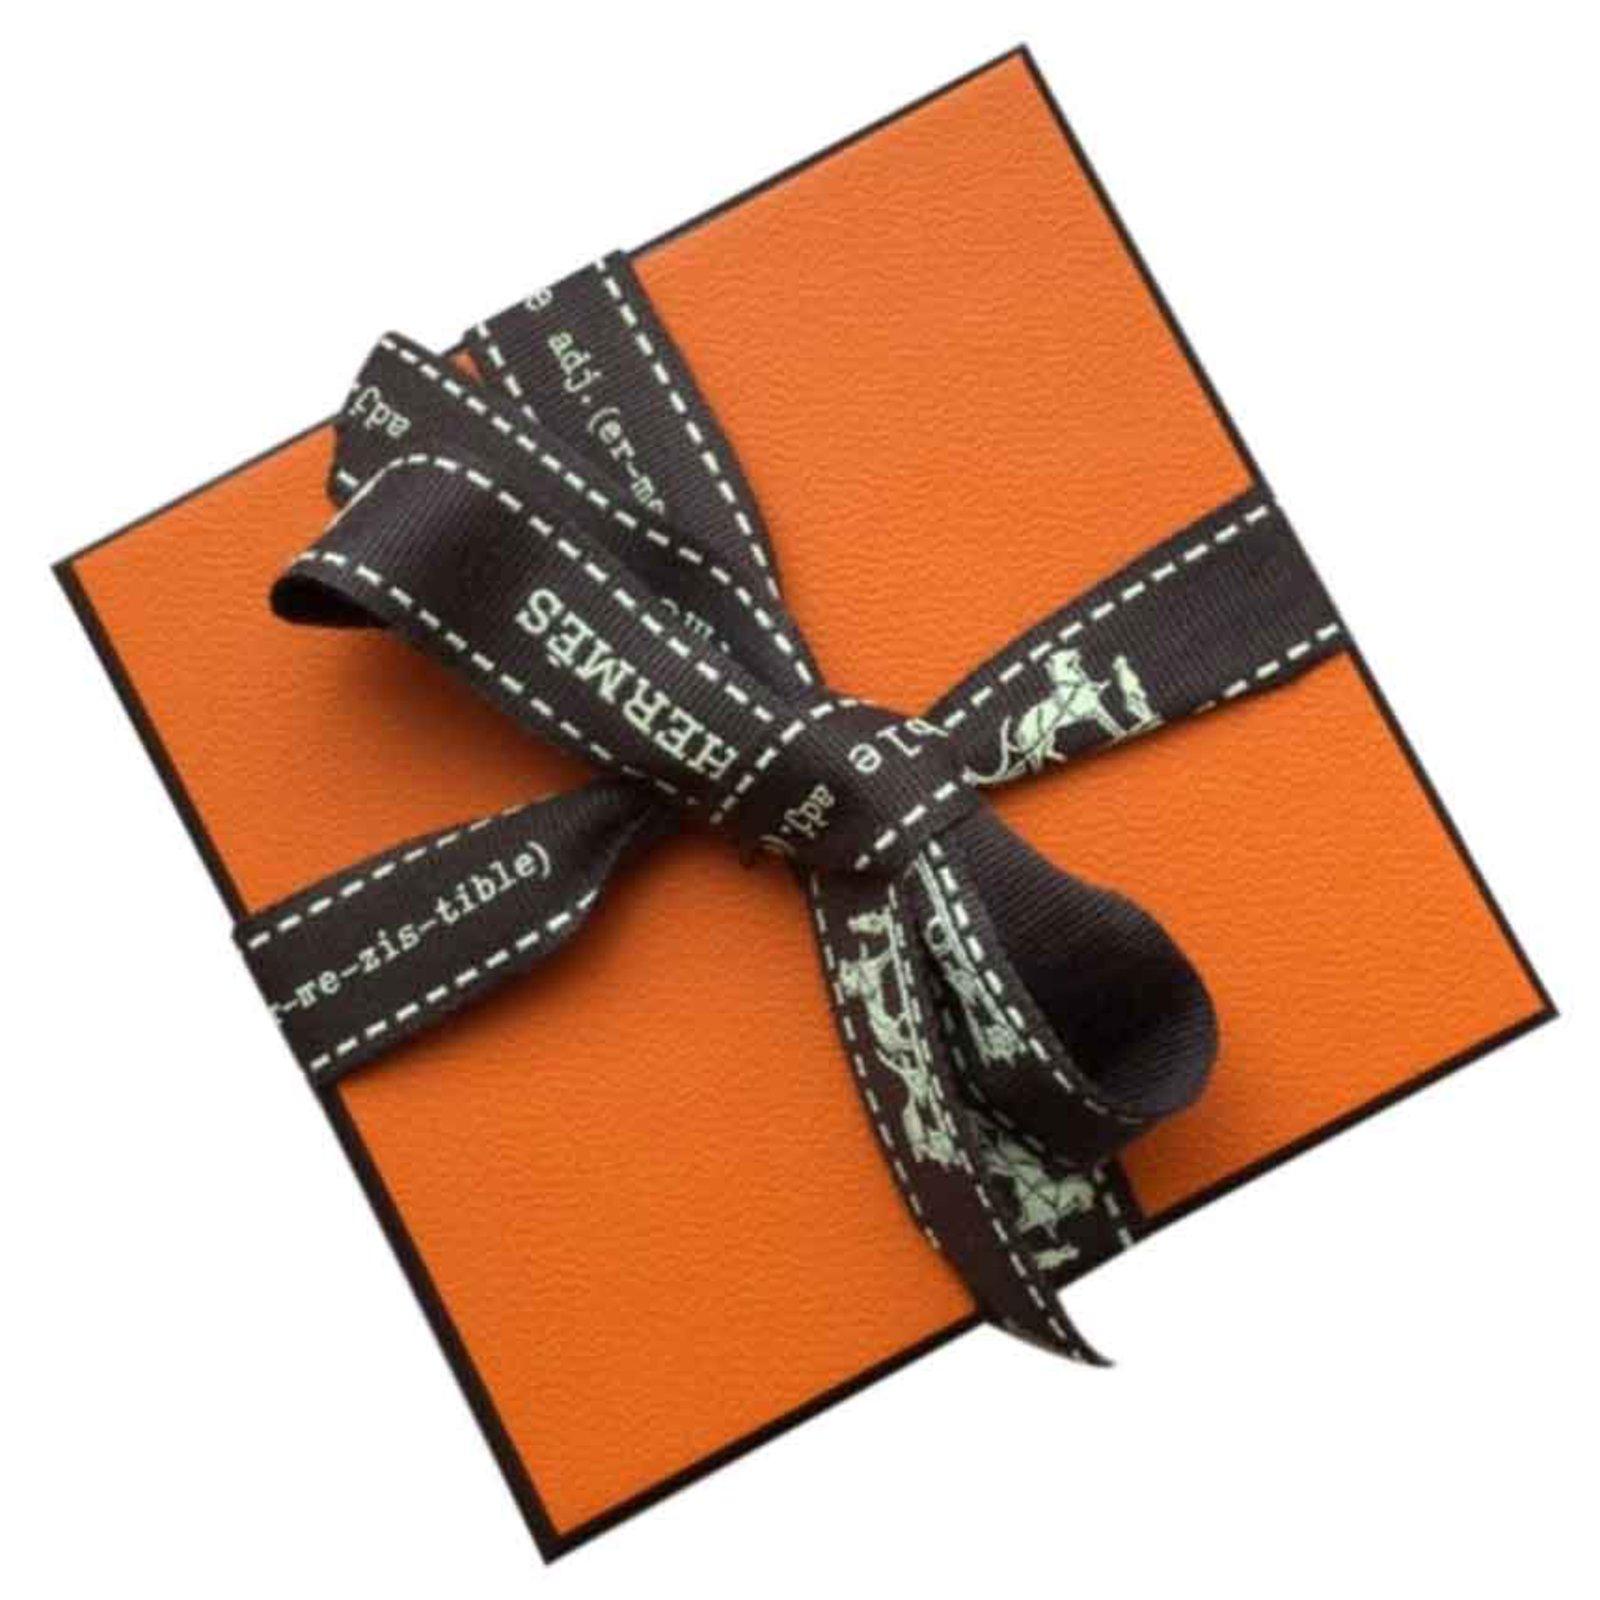 fa3b914d58a1 Bracelets Hermès Bracelet Hermes Goliath Cuir Noir ref.25611 - Joli Closet